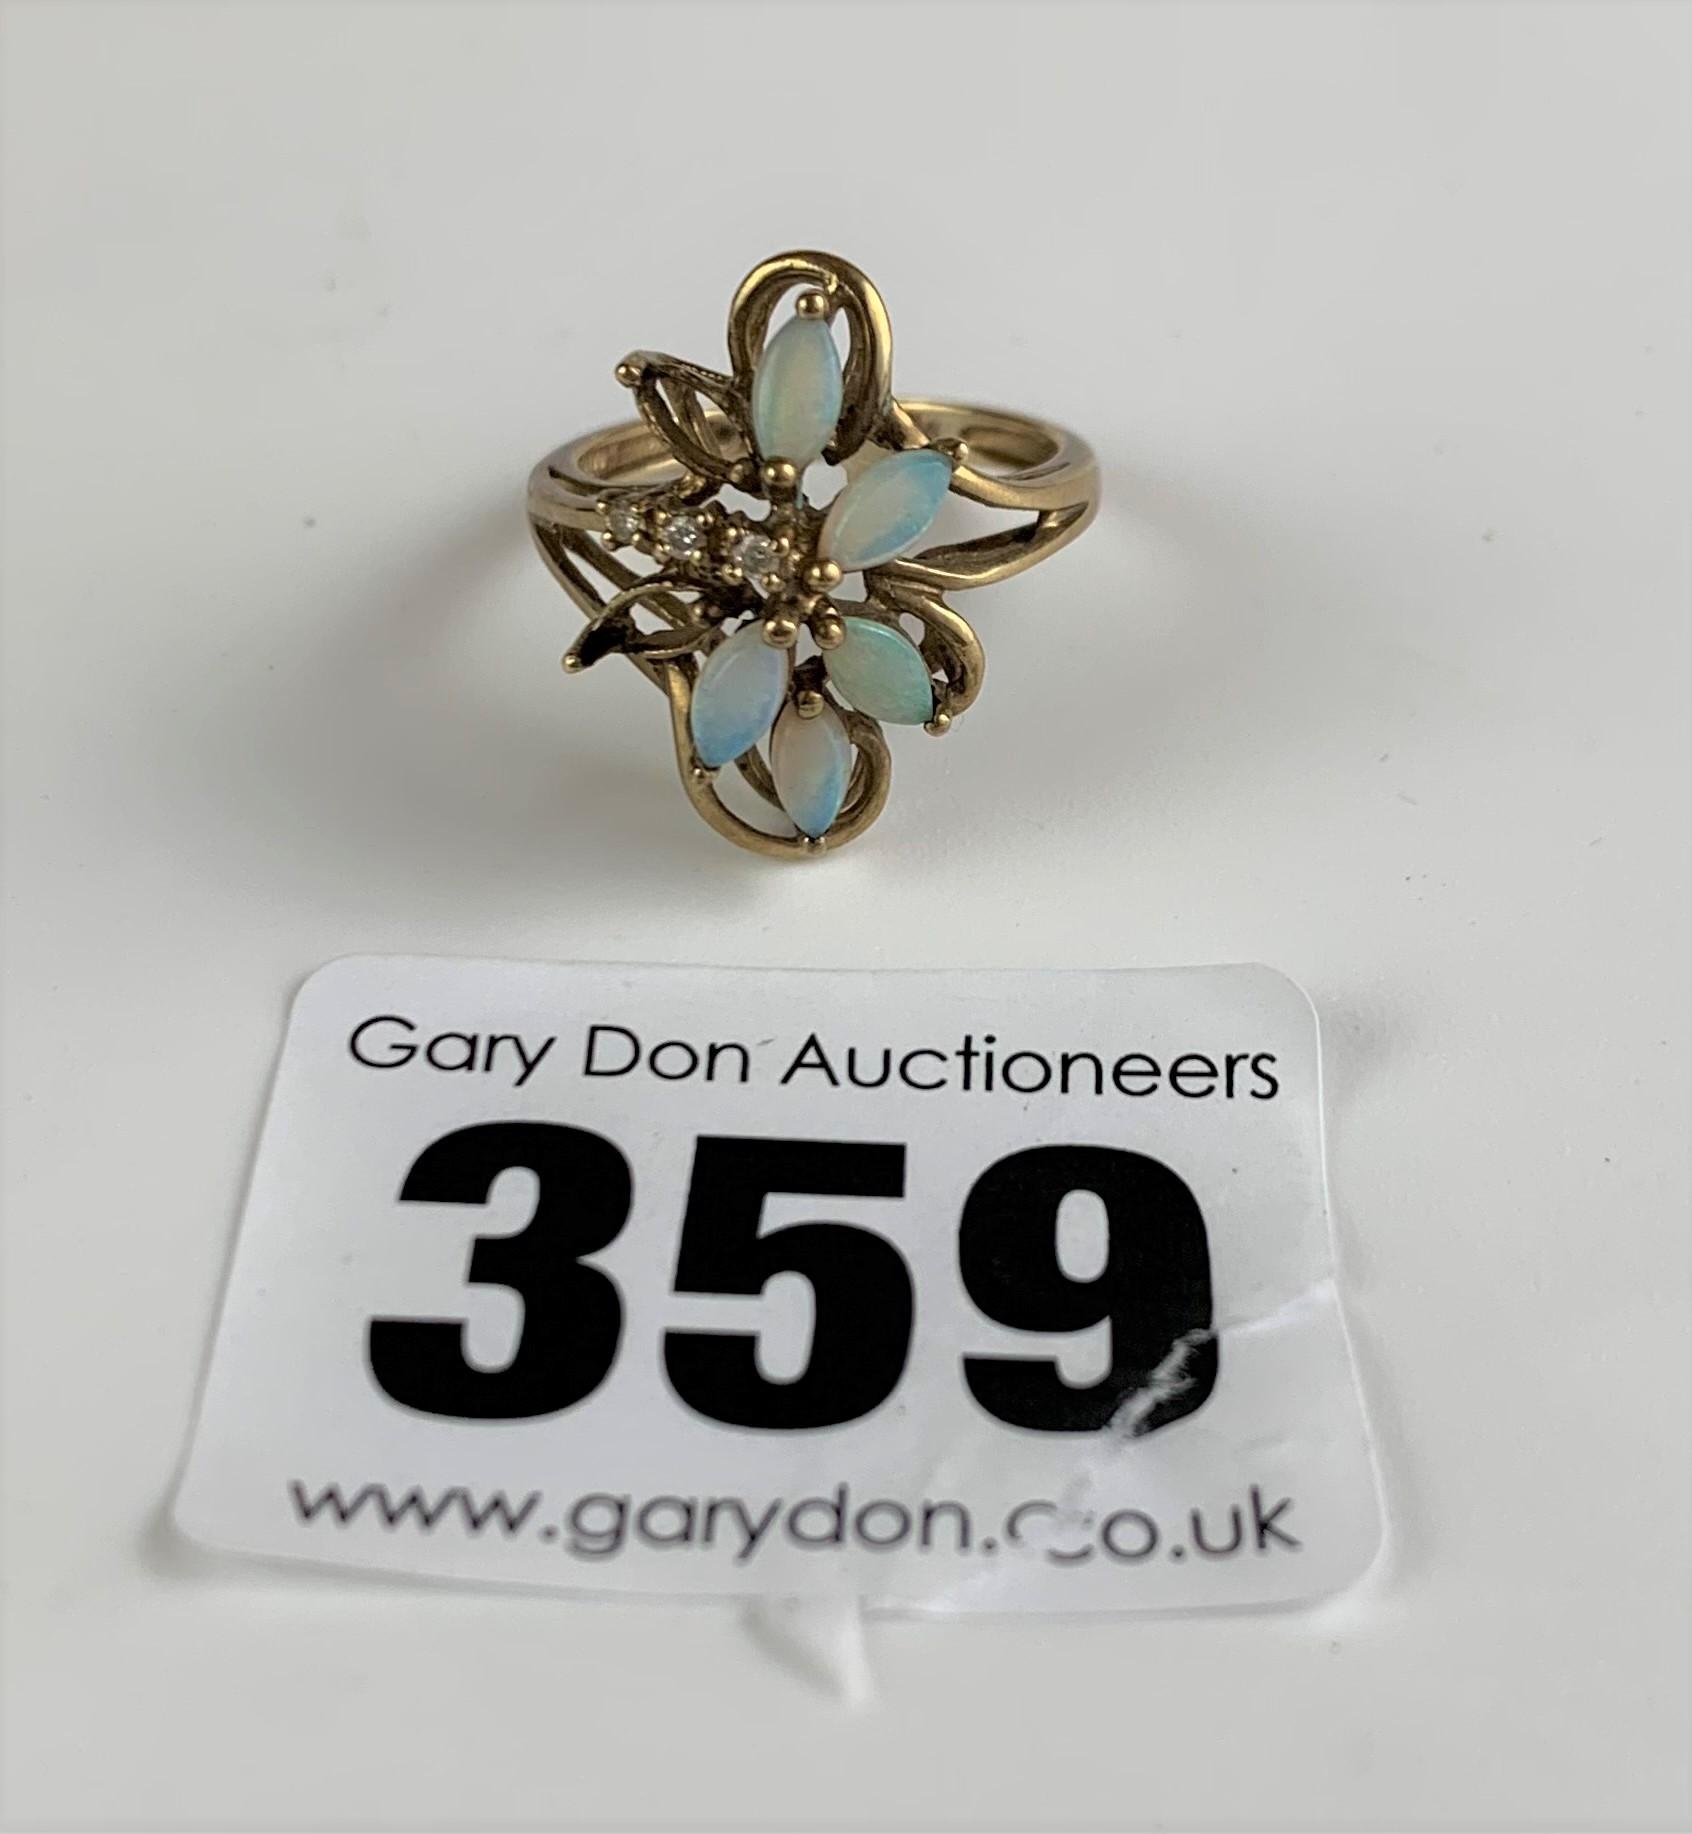 9k gold ring with opal flower design, size K, w: 2.6 gms - Image 3 of 5